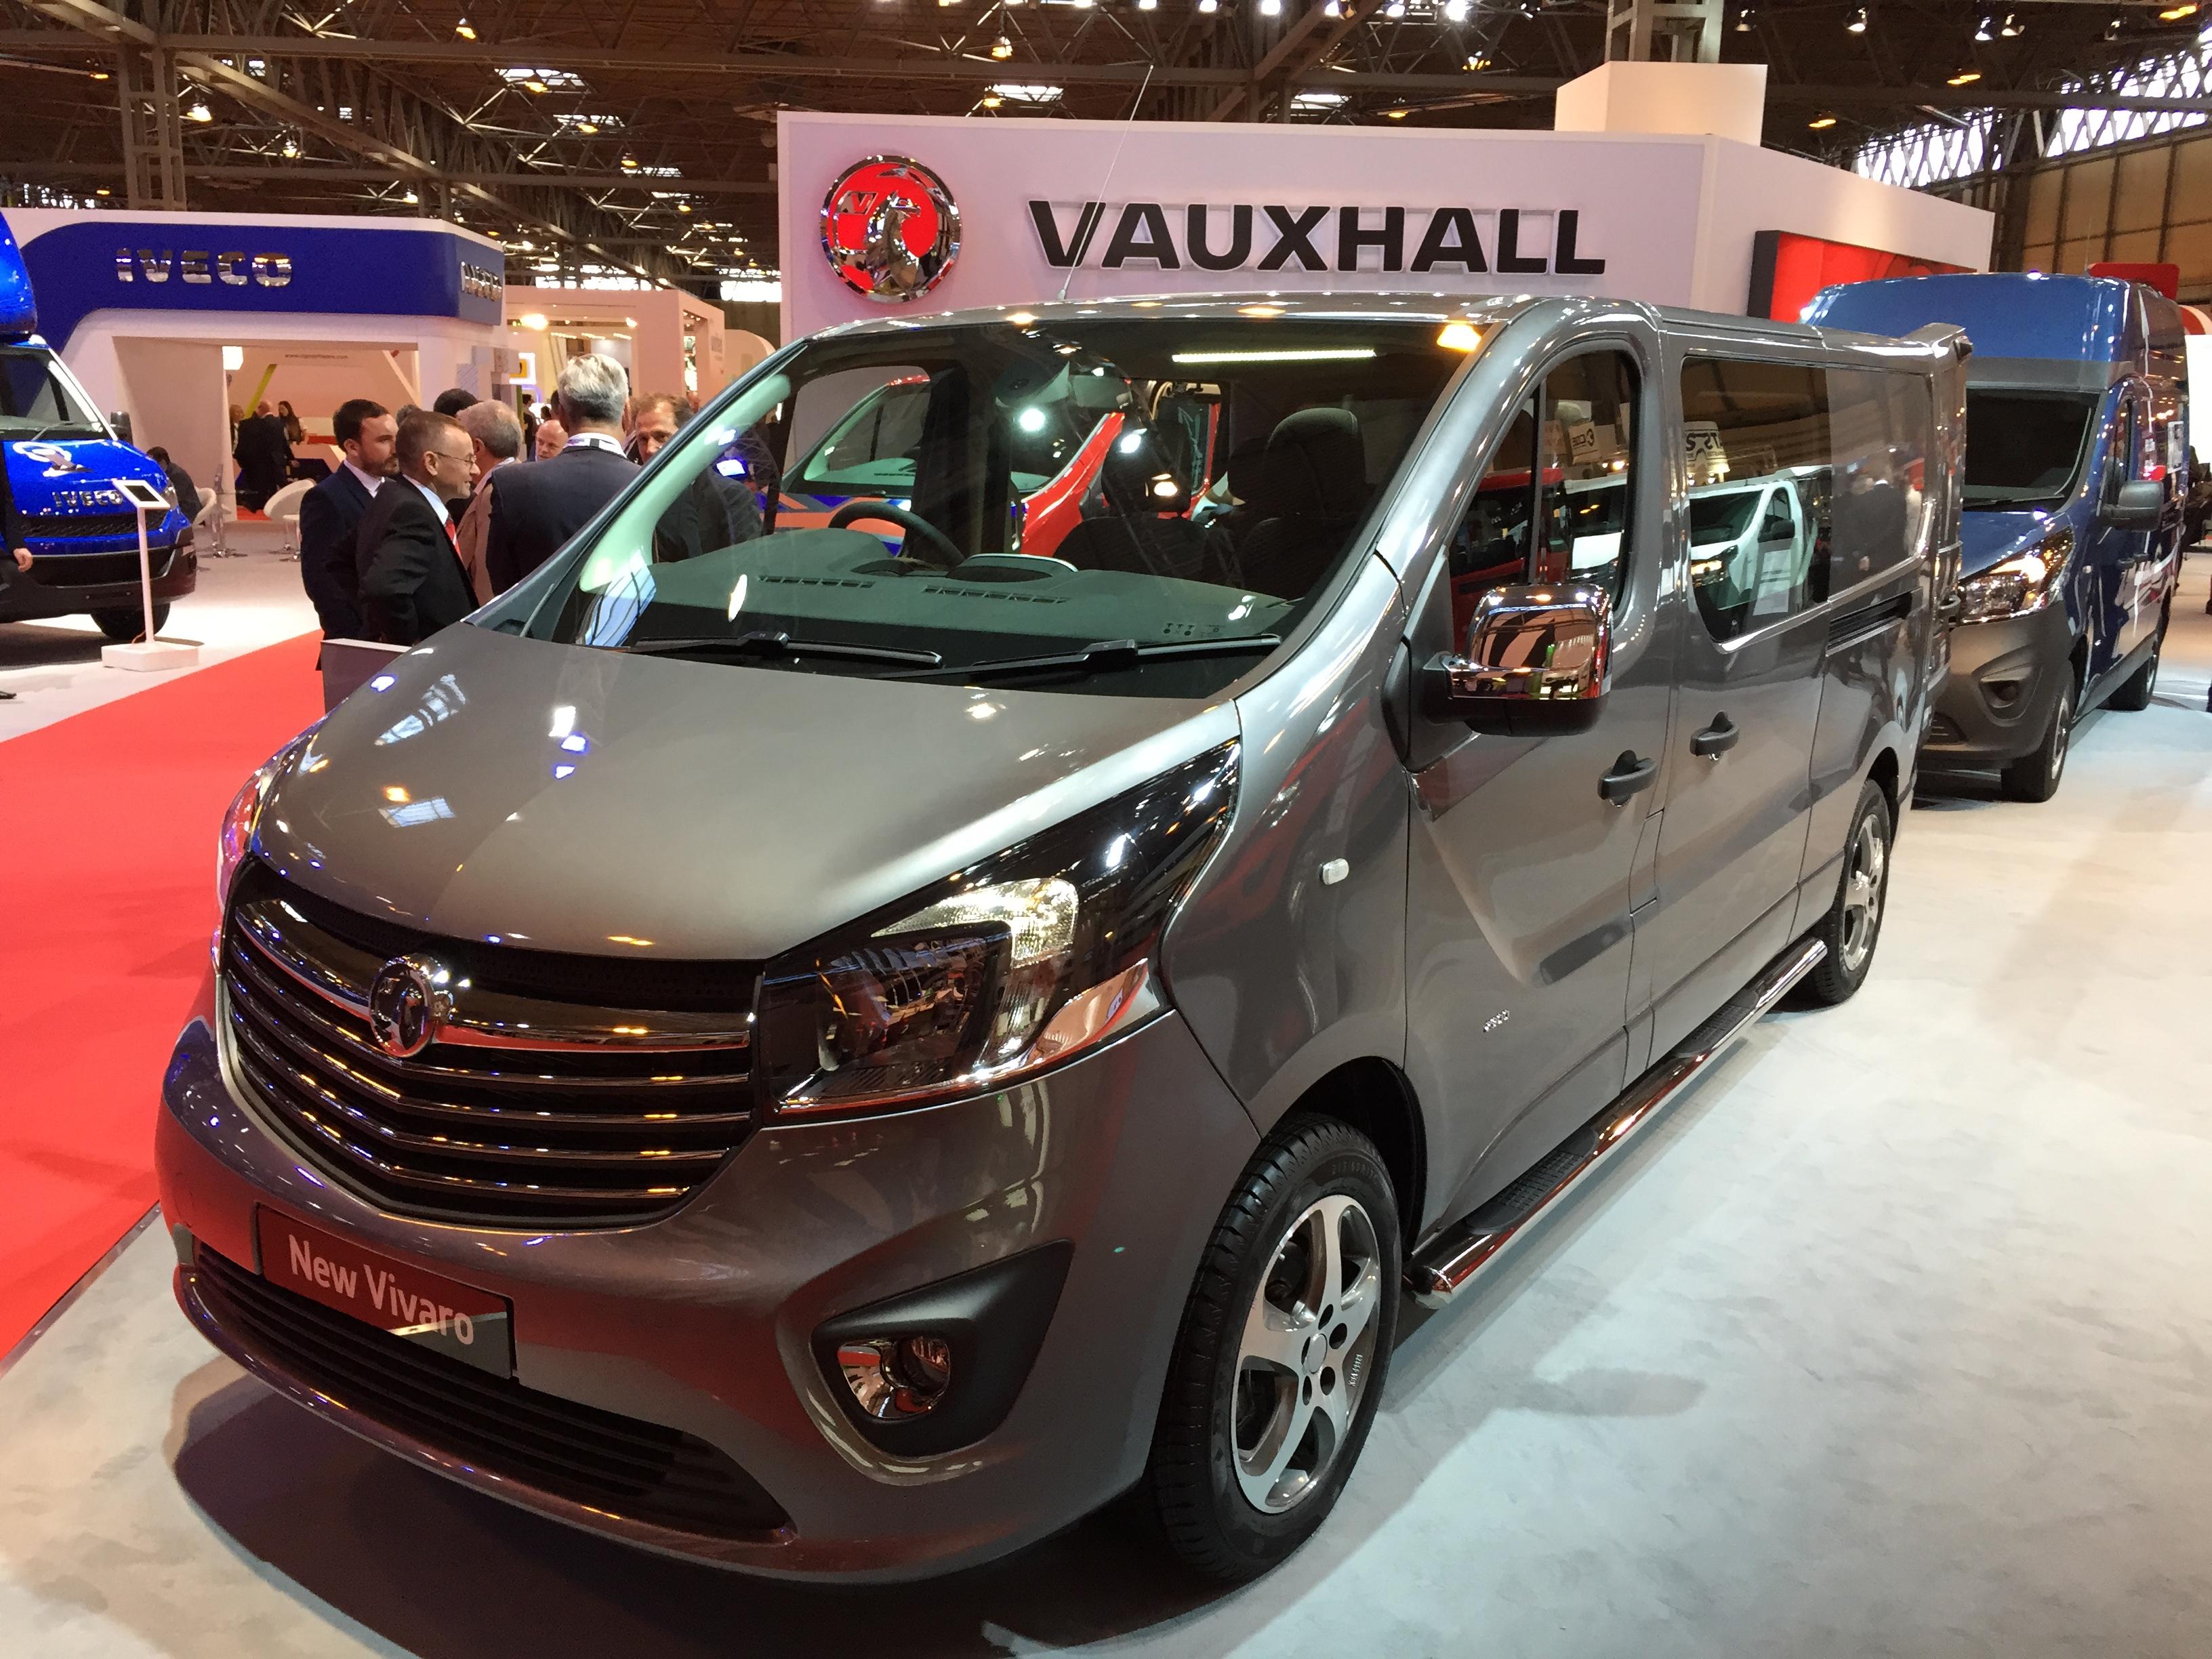 New Vivaro Combi Siberia | Business Vans